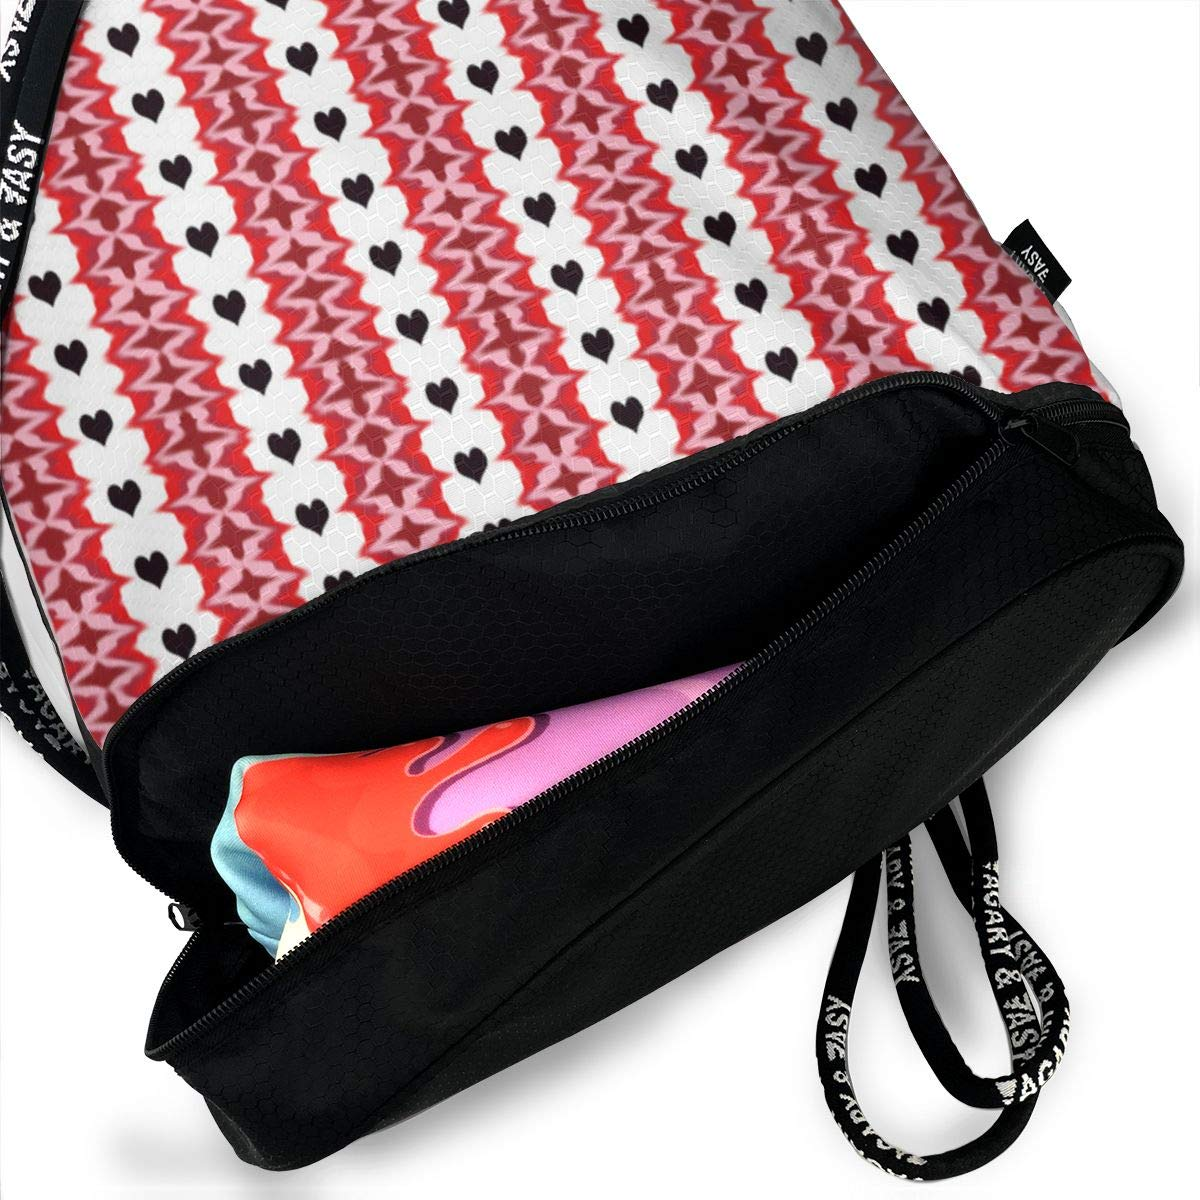 Blackheartedstripe2 Drawstring Backpack Sports Athletic Gym Cinch Sack String Storage Bags for Hiking Travel Beach